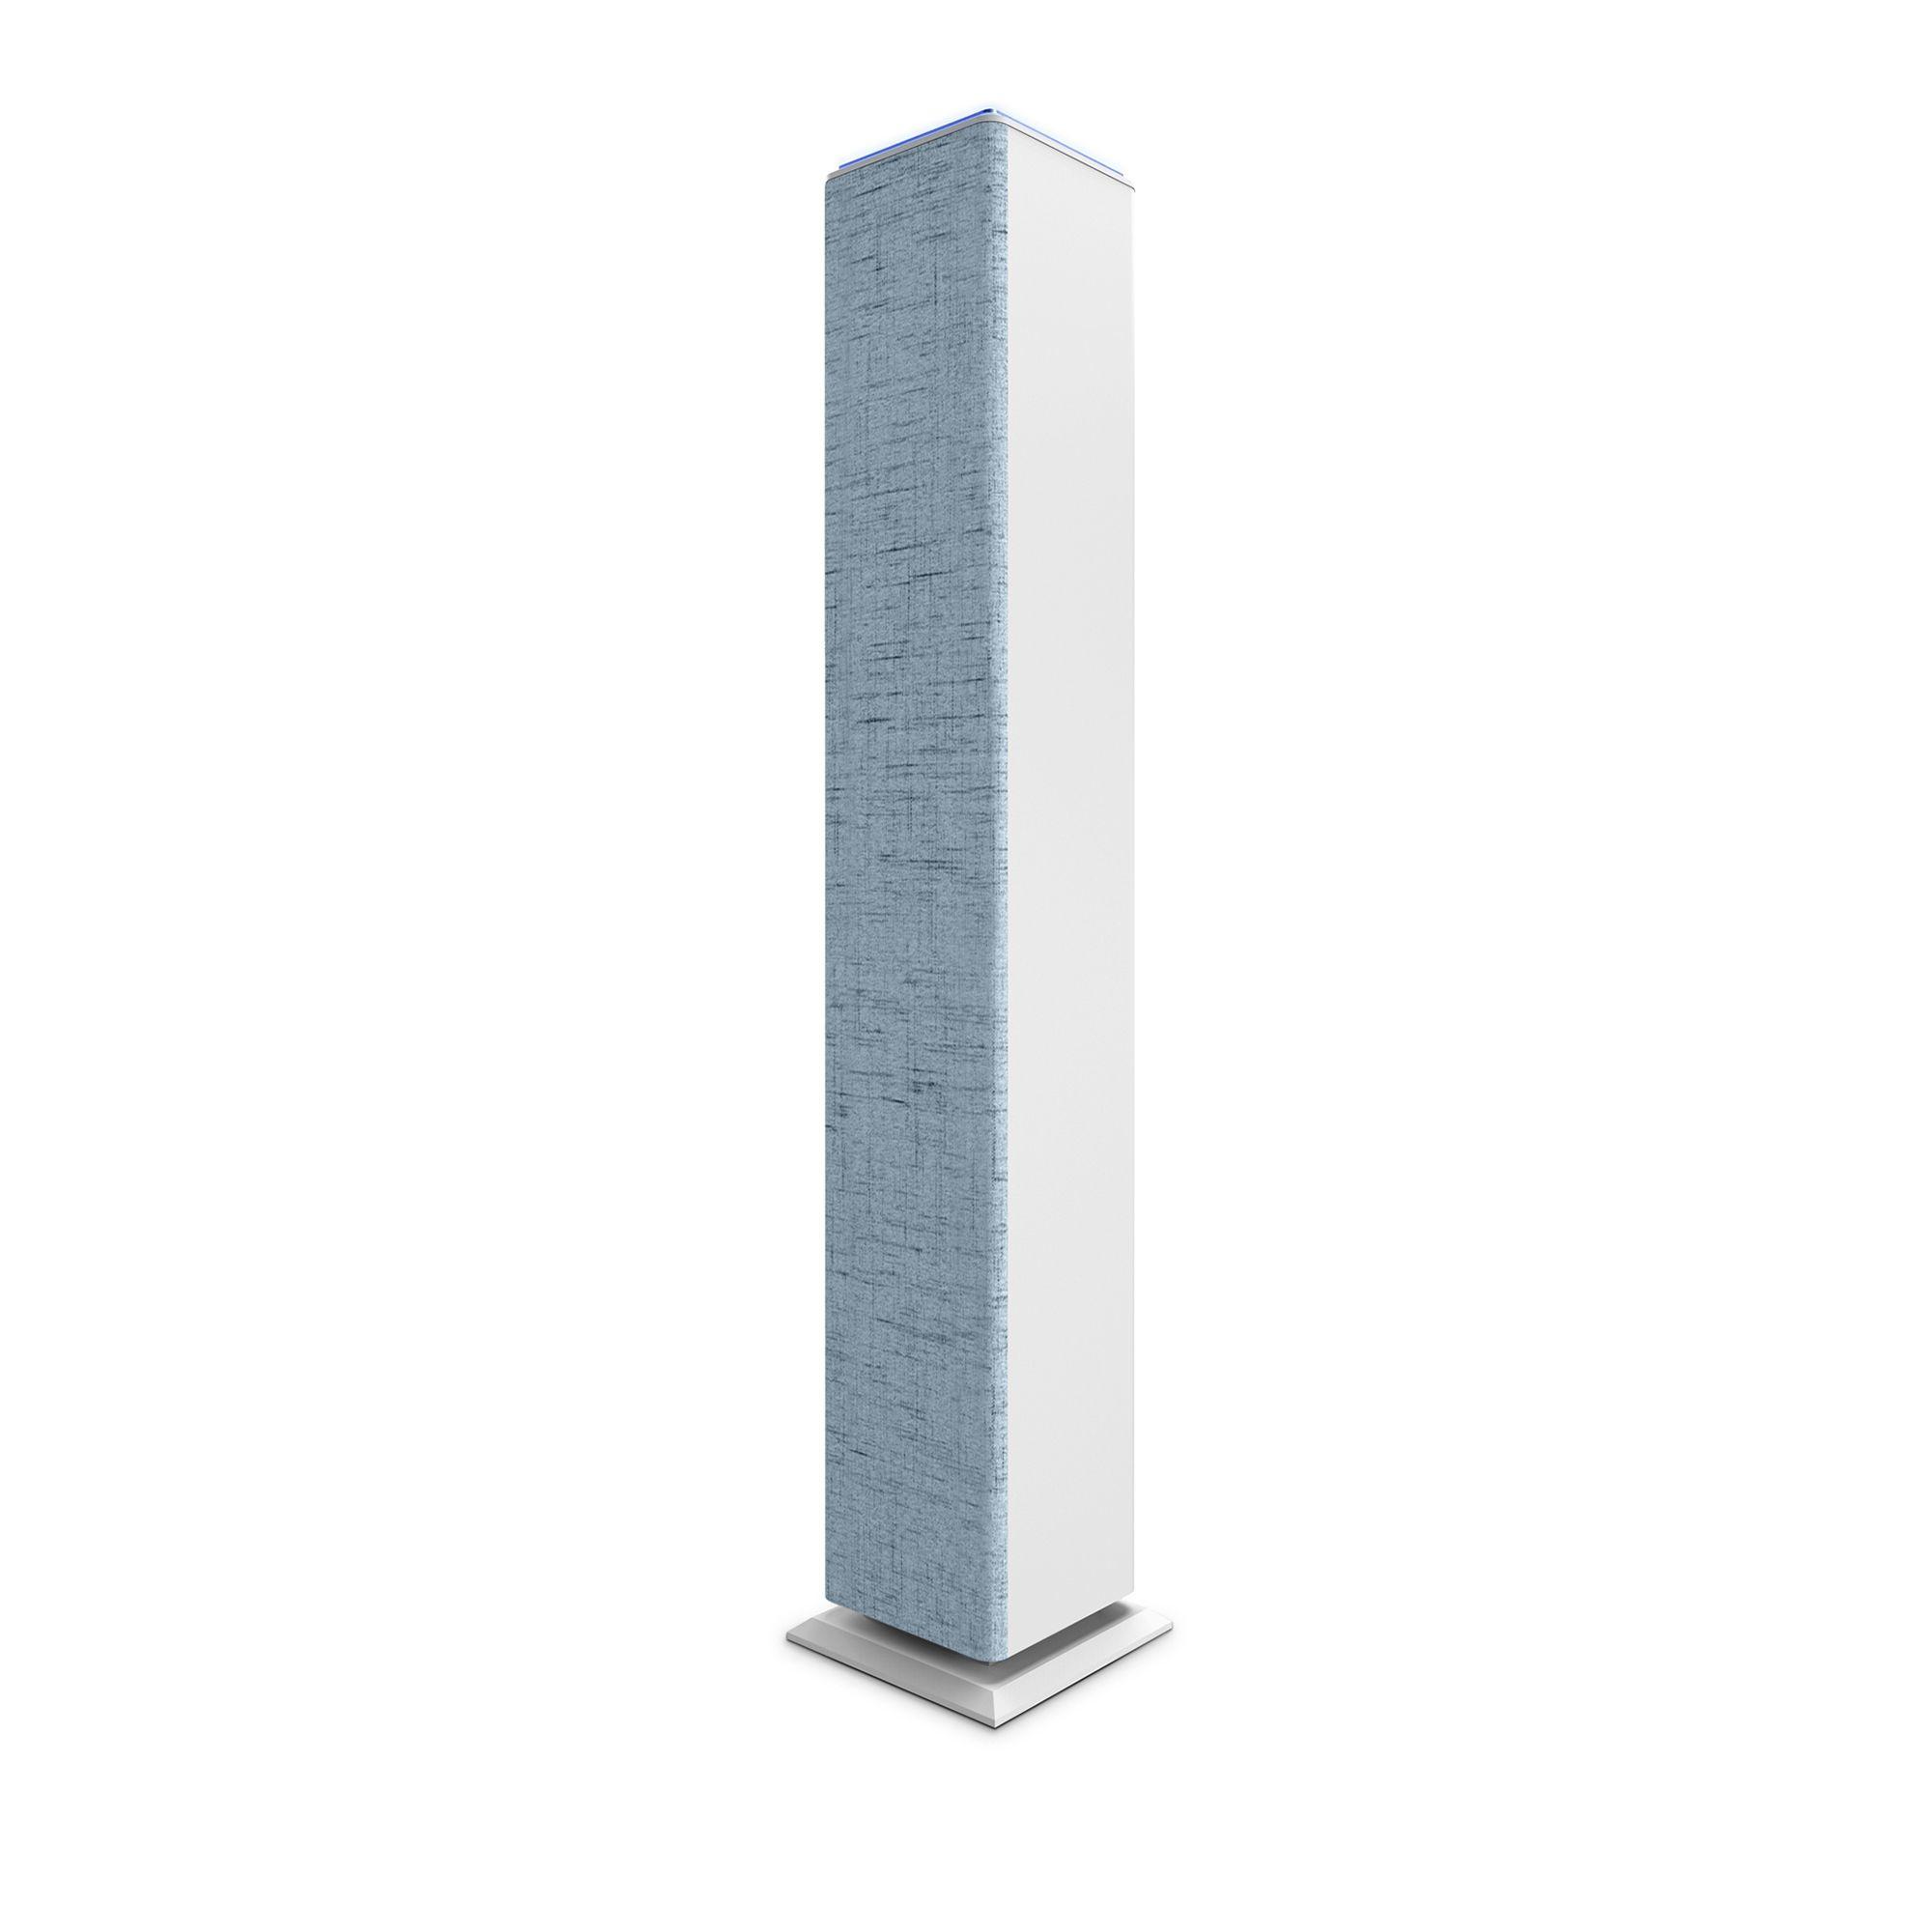 Energy Sistem Smart 7 Tower Blanco 40 W